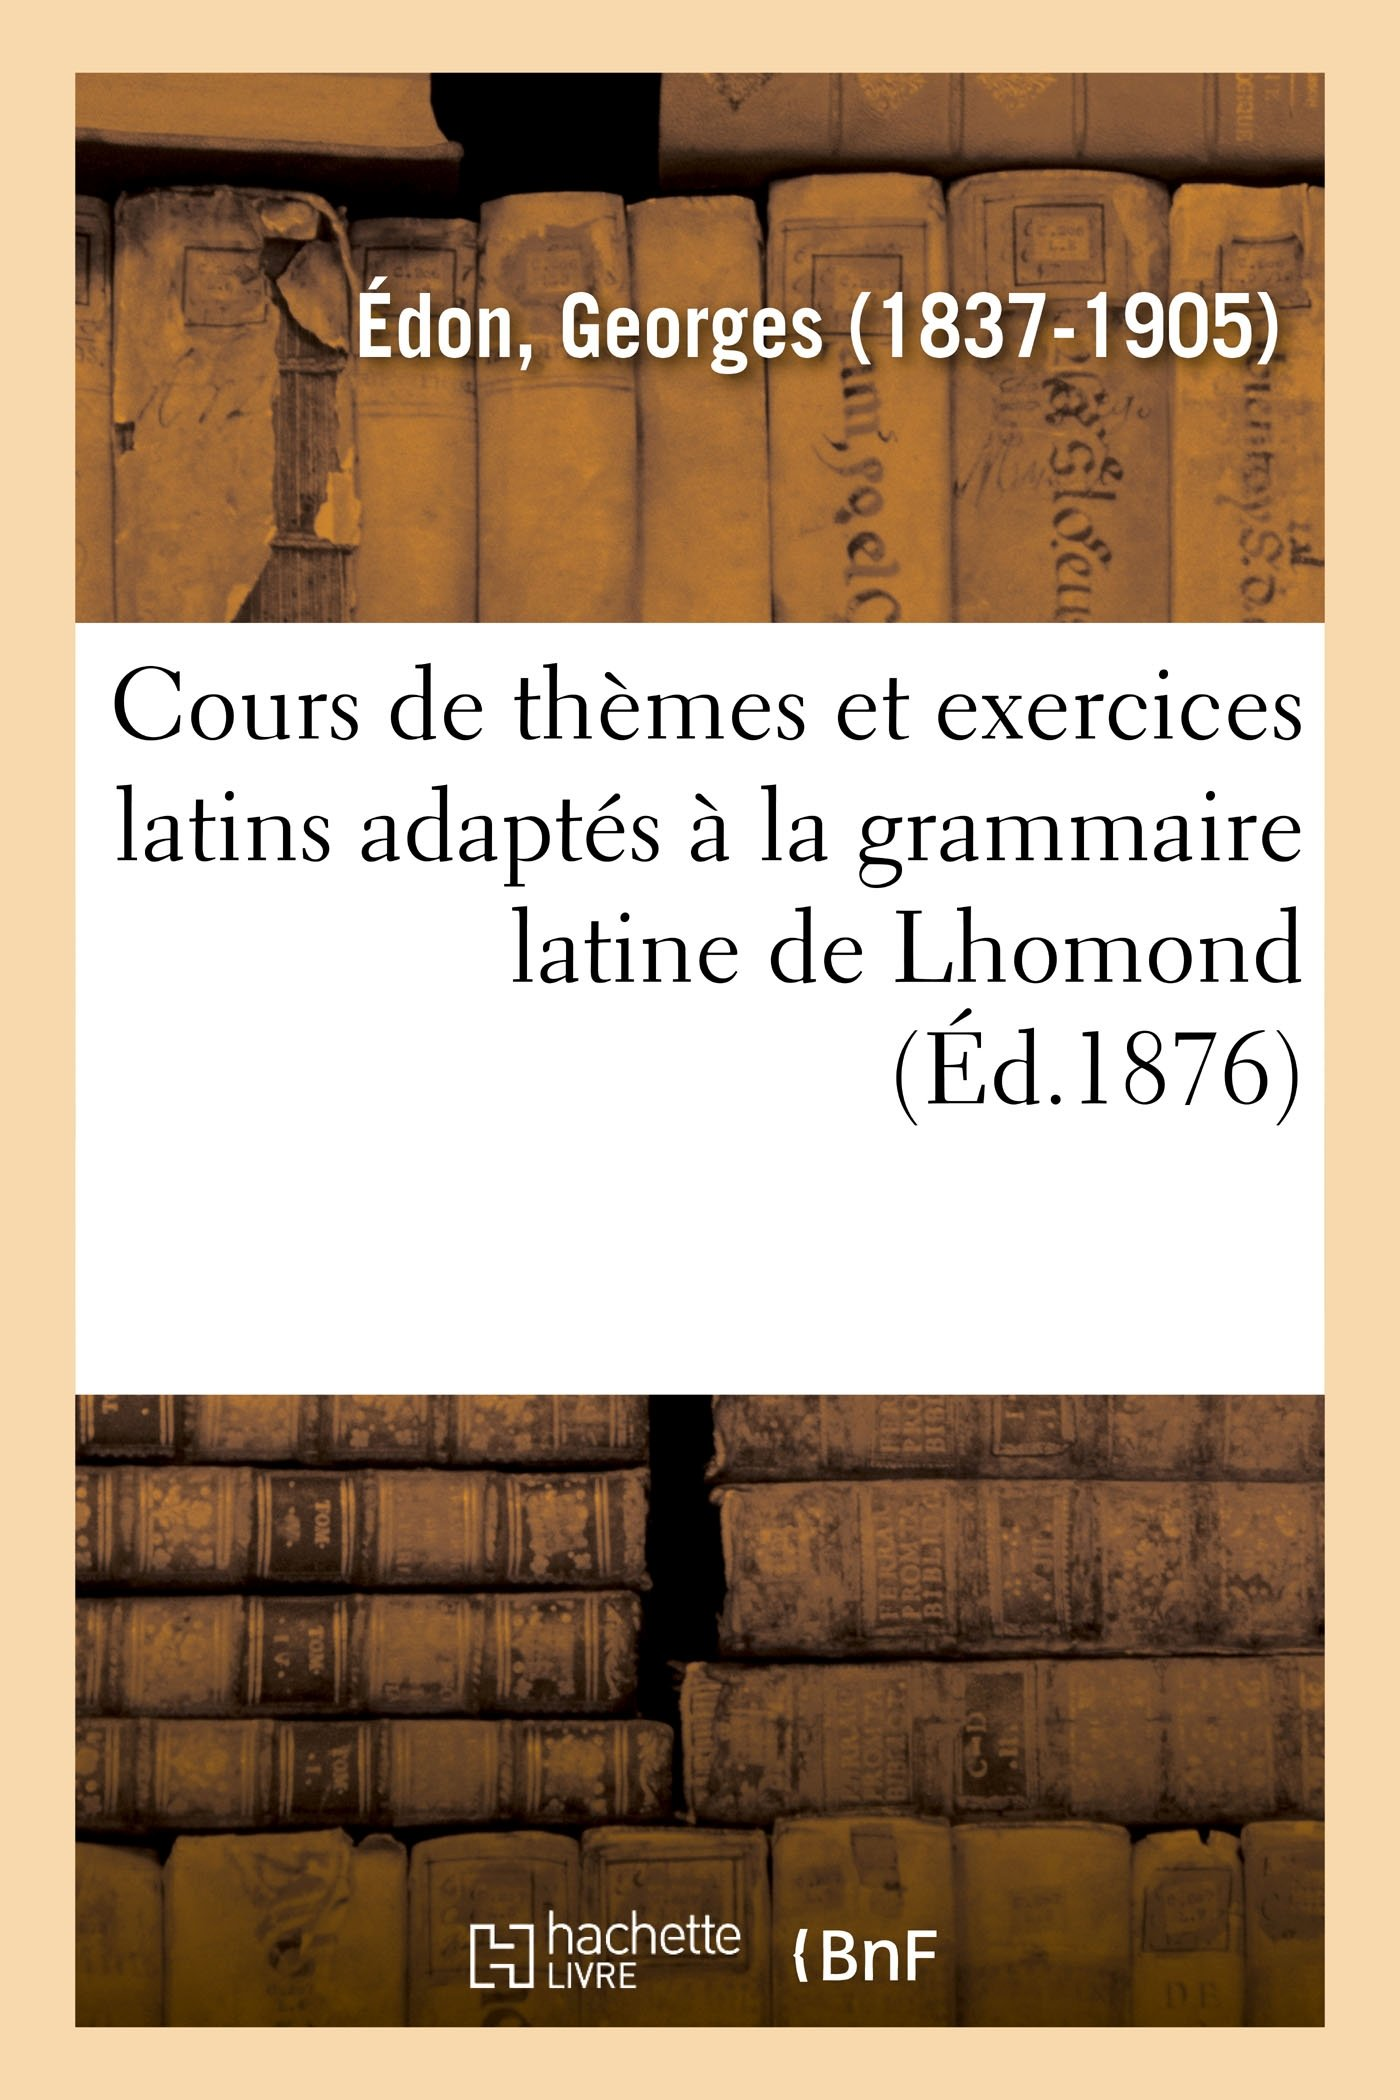 8 st latins